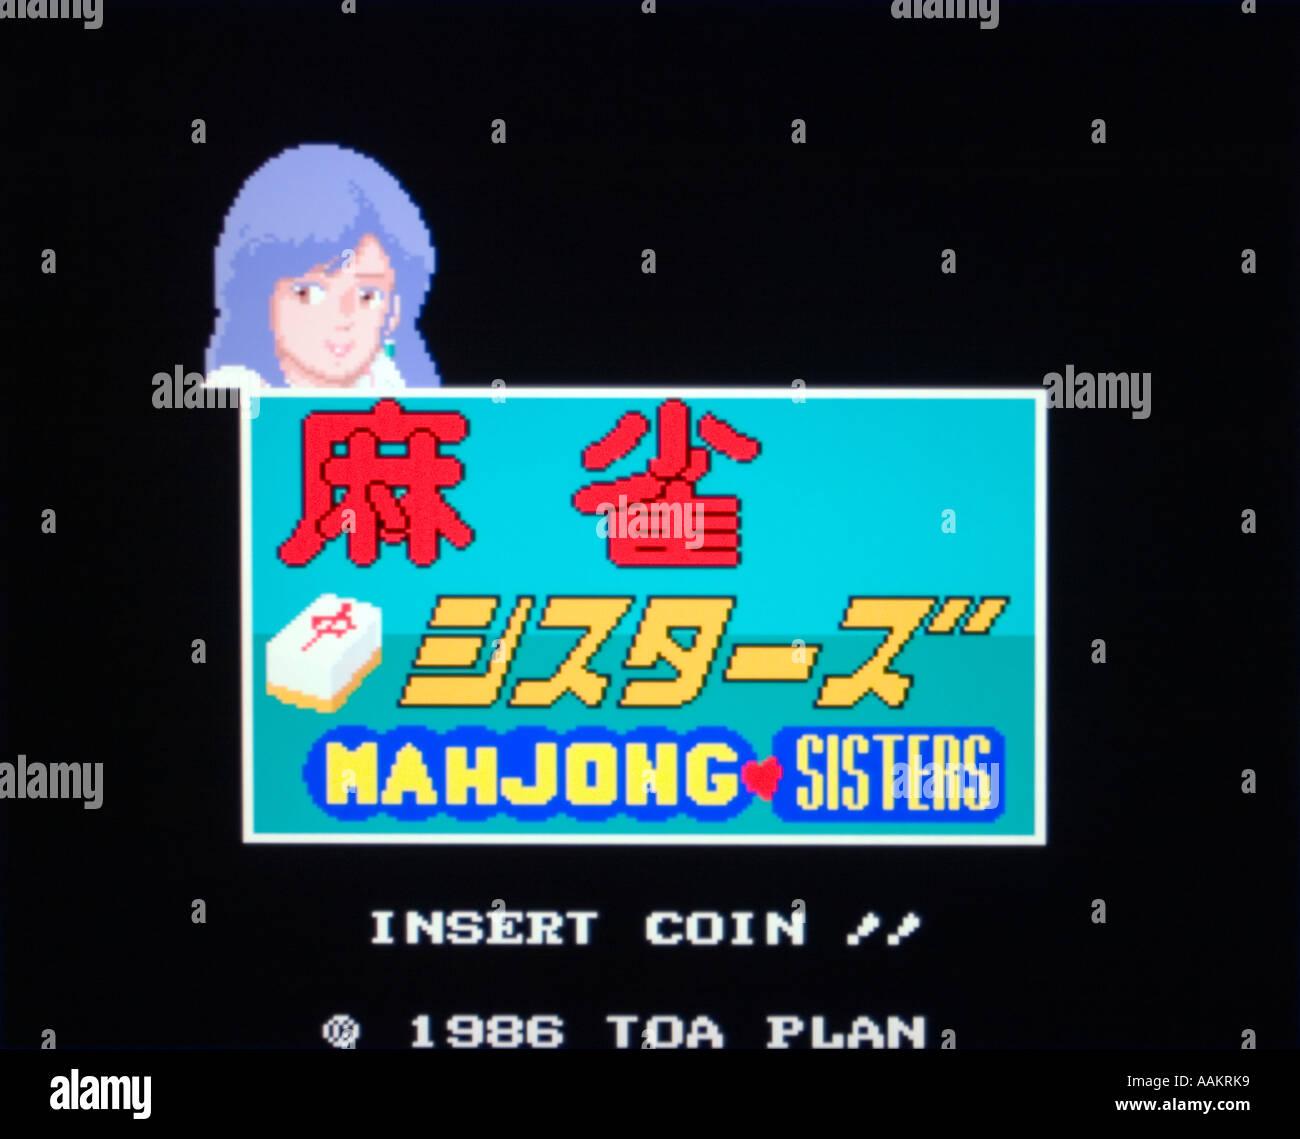 Mahjong Sisters Toa Plan Toaplan 1986 vintage arcade videogame screenshot - EDITORIAL USE ONLY Stock Photo